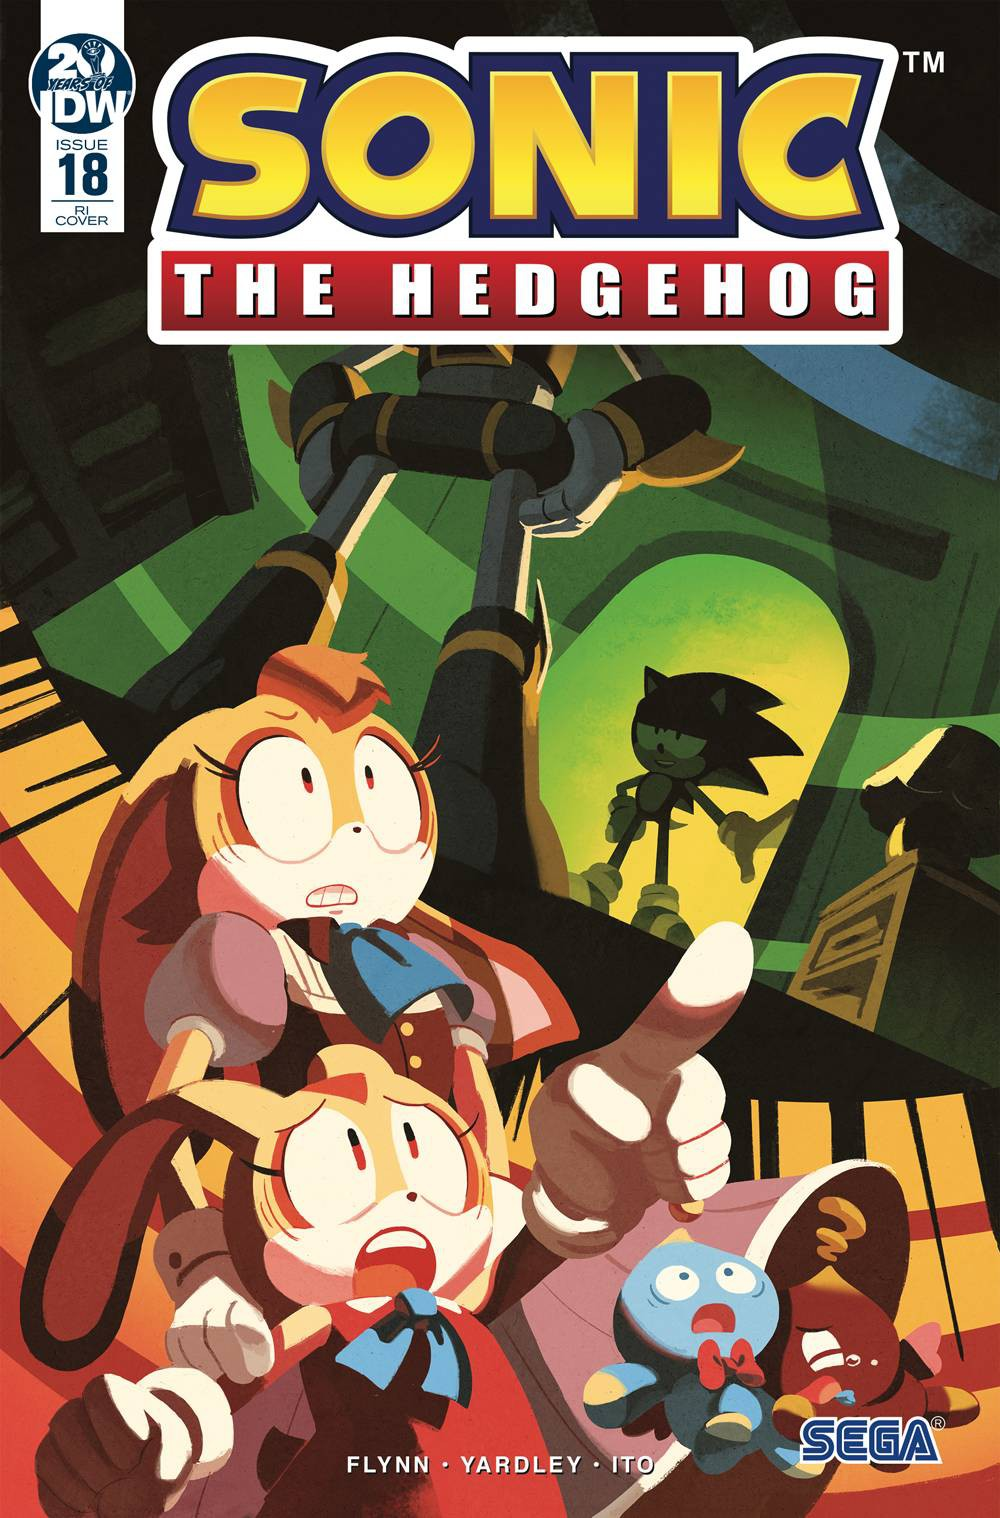 Idw Sonic The Hedgehog 18 Comic Book Nathalie Fourdraine Variant Cover Ebay